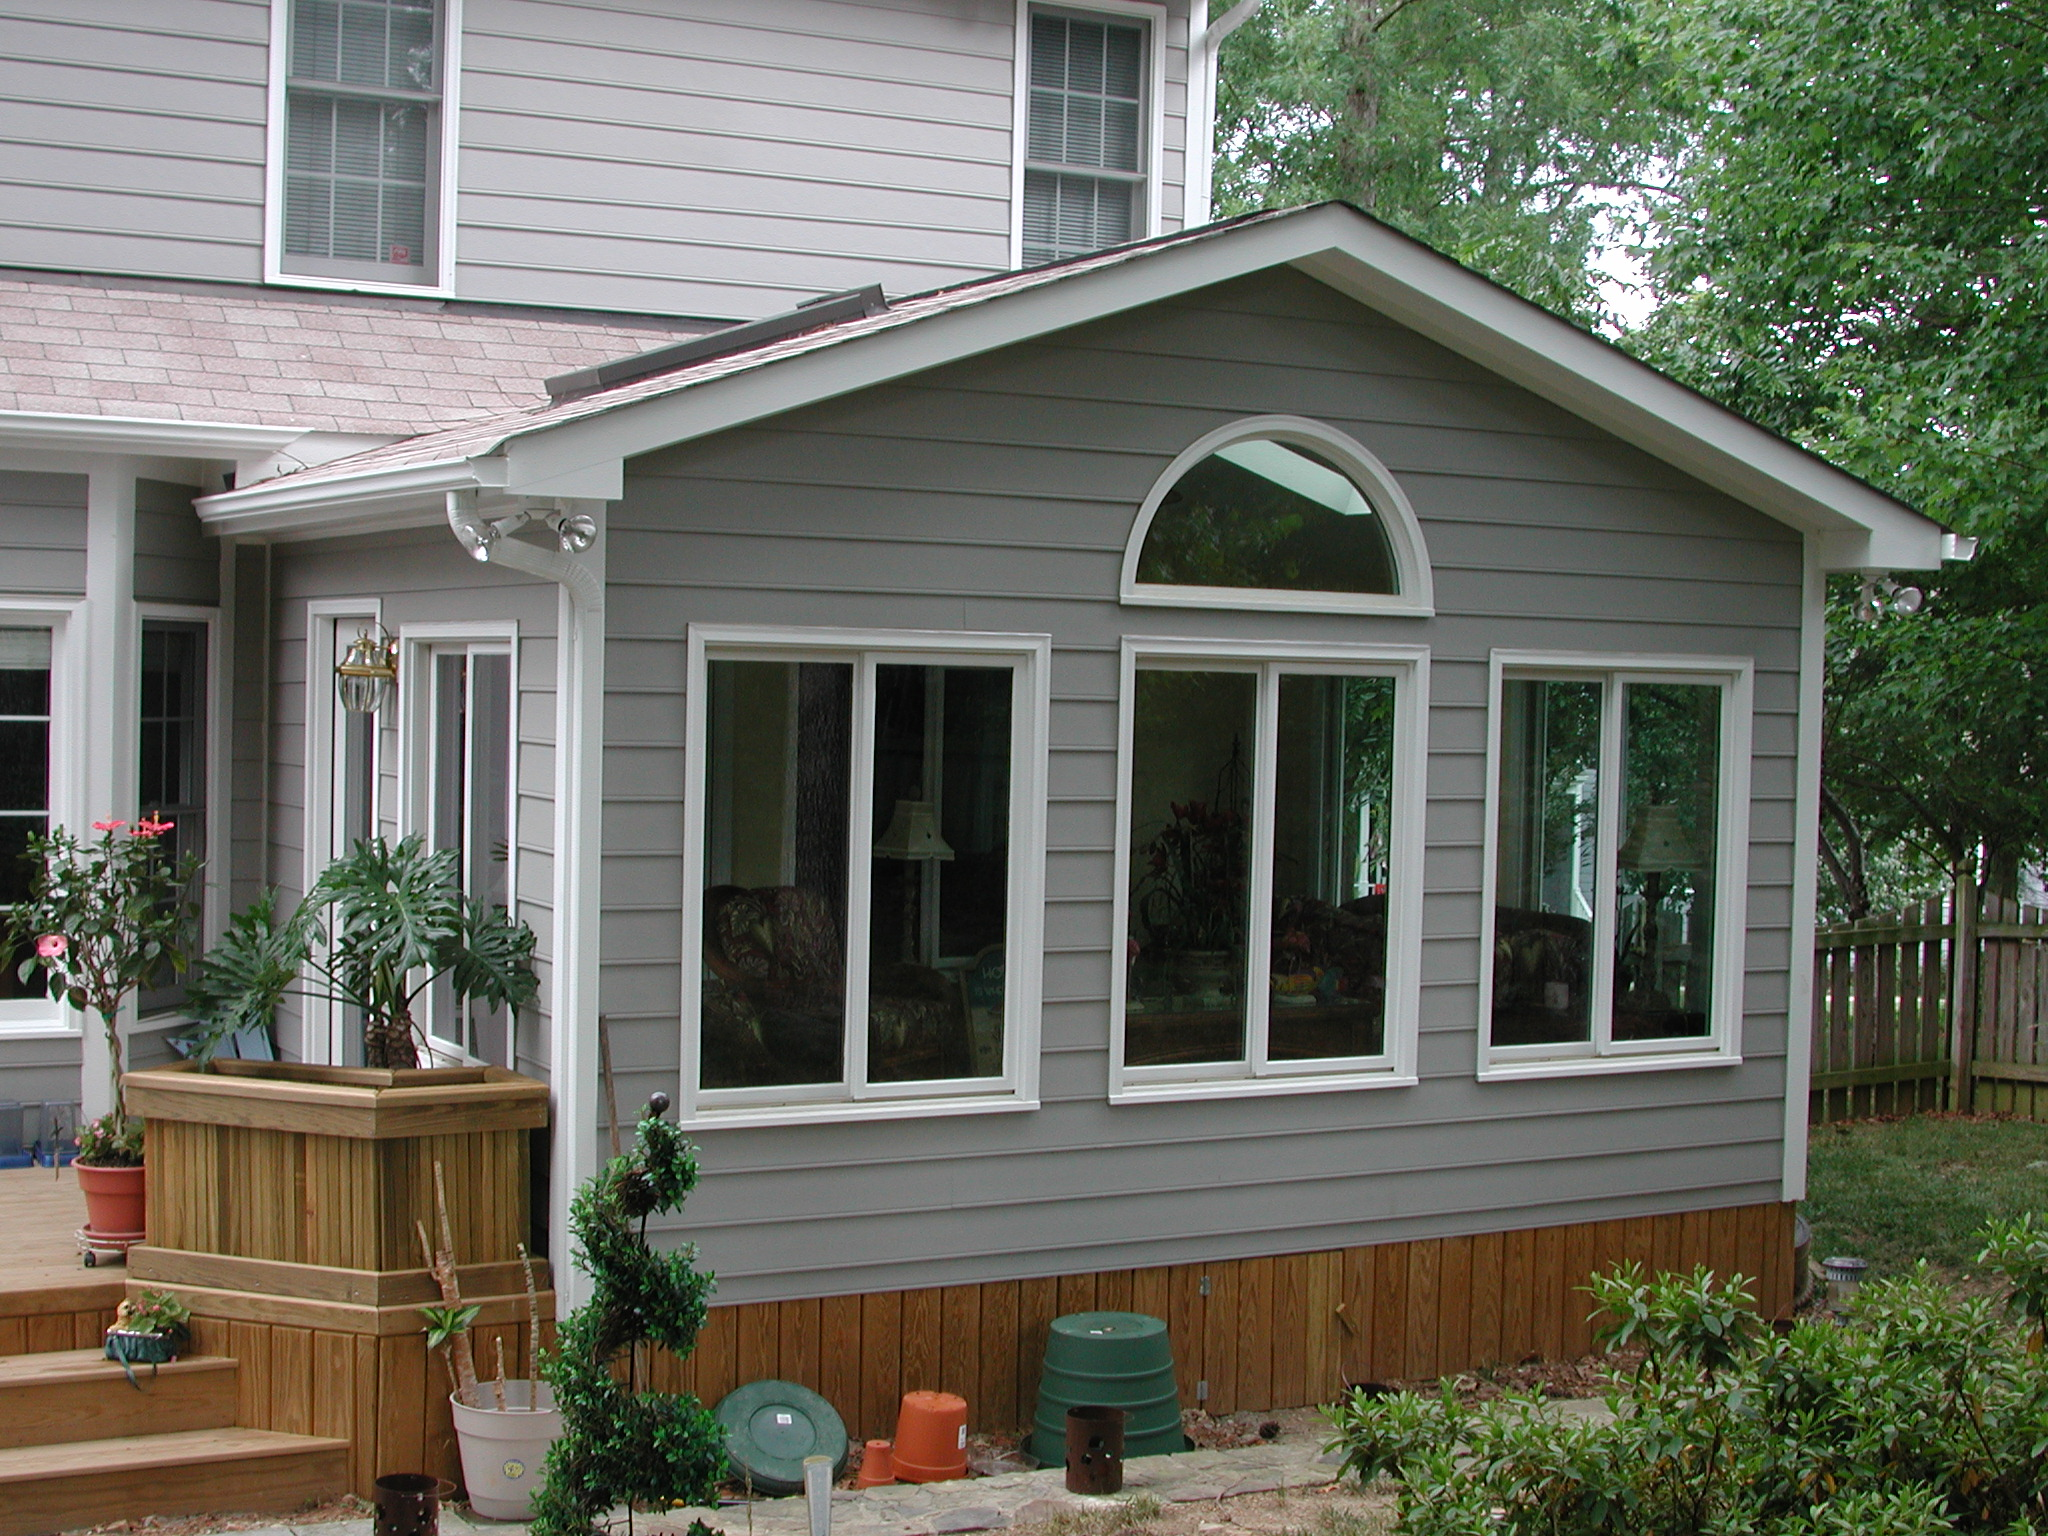 Home Sunroom Addition Ideas HomesFeed